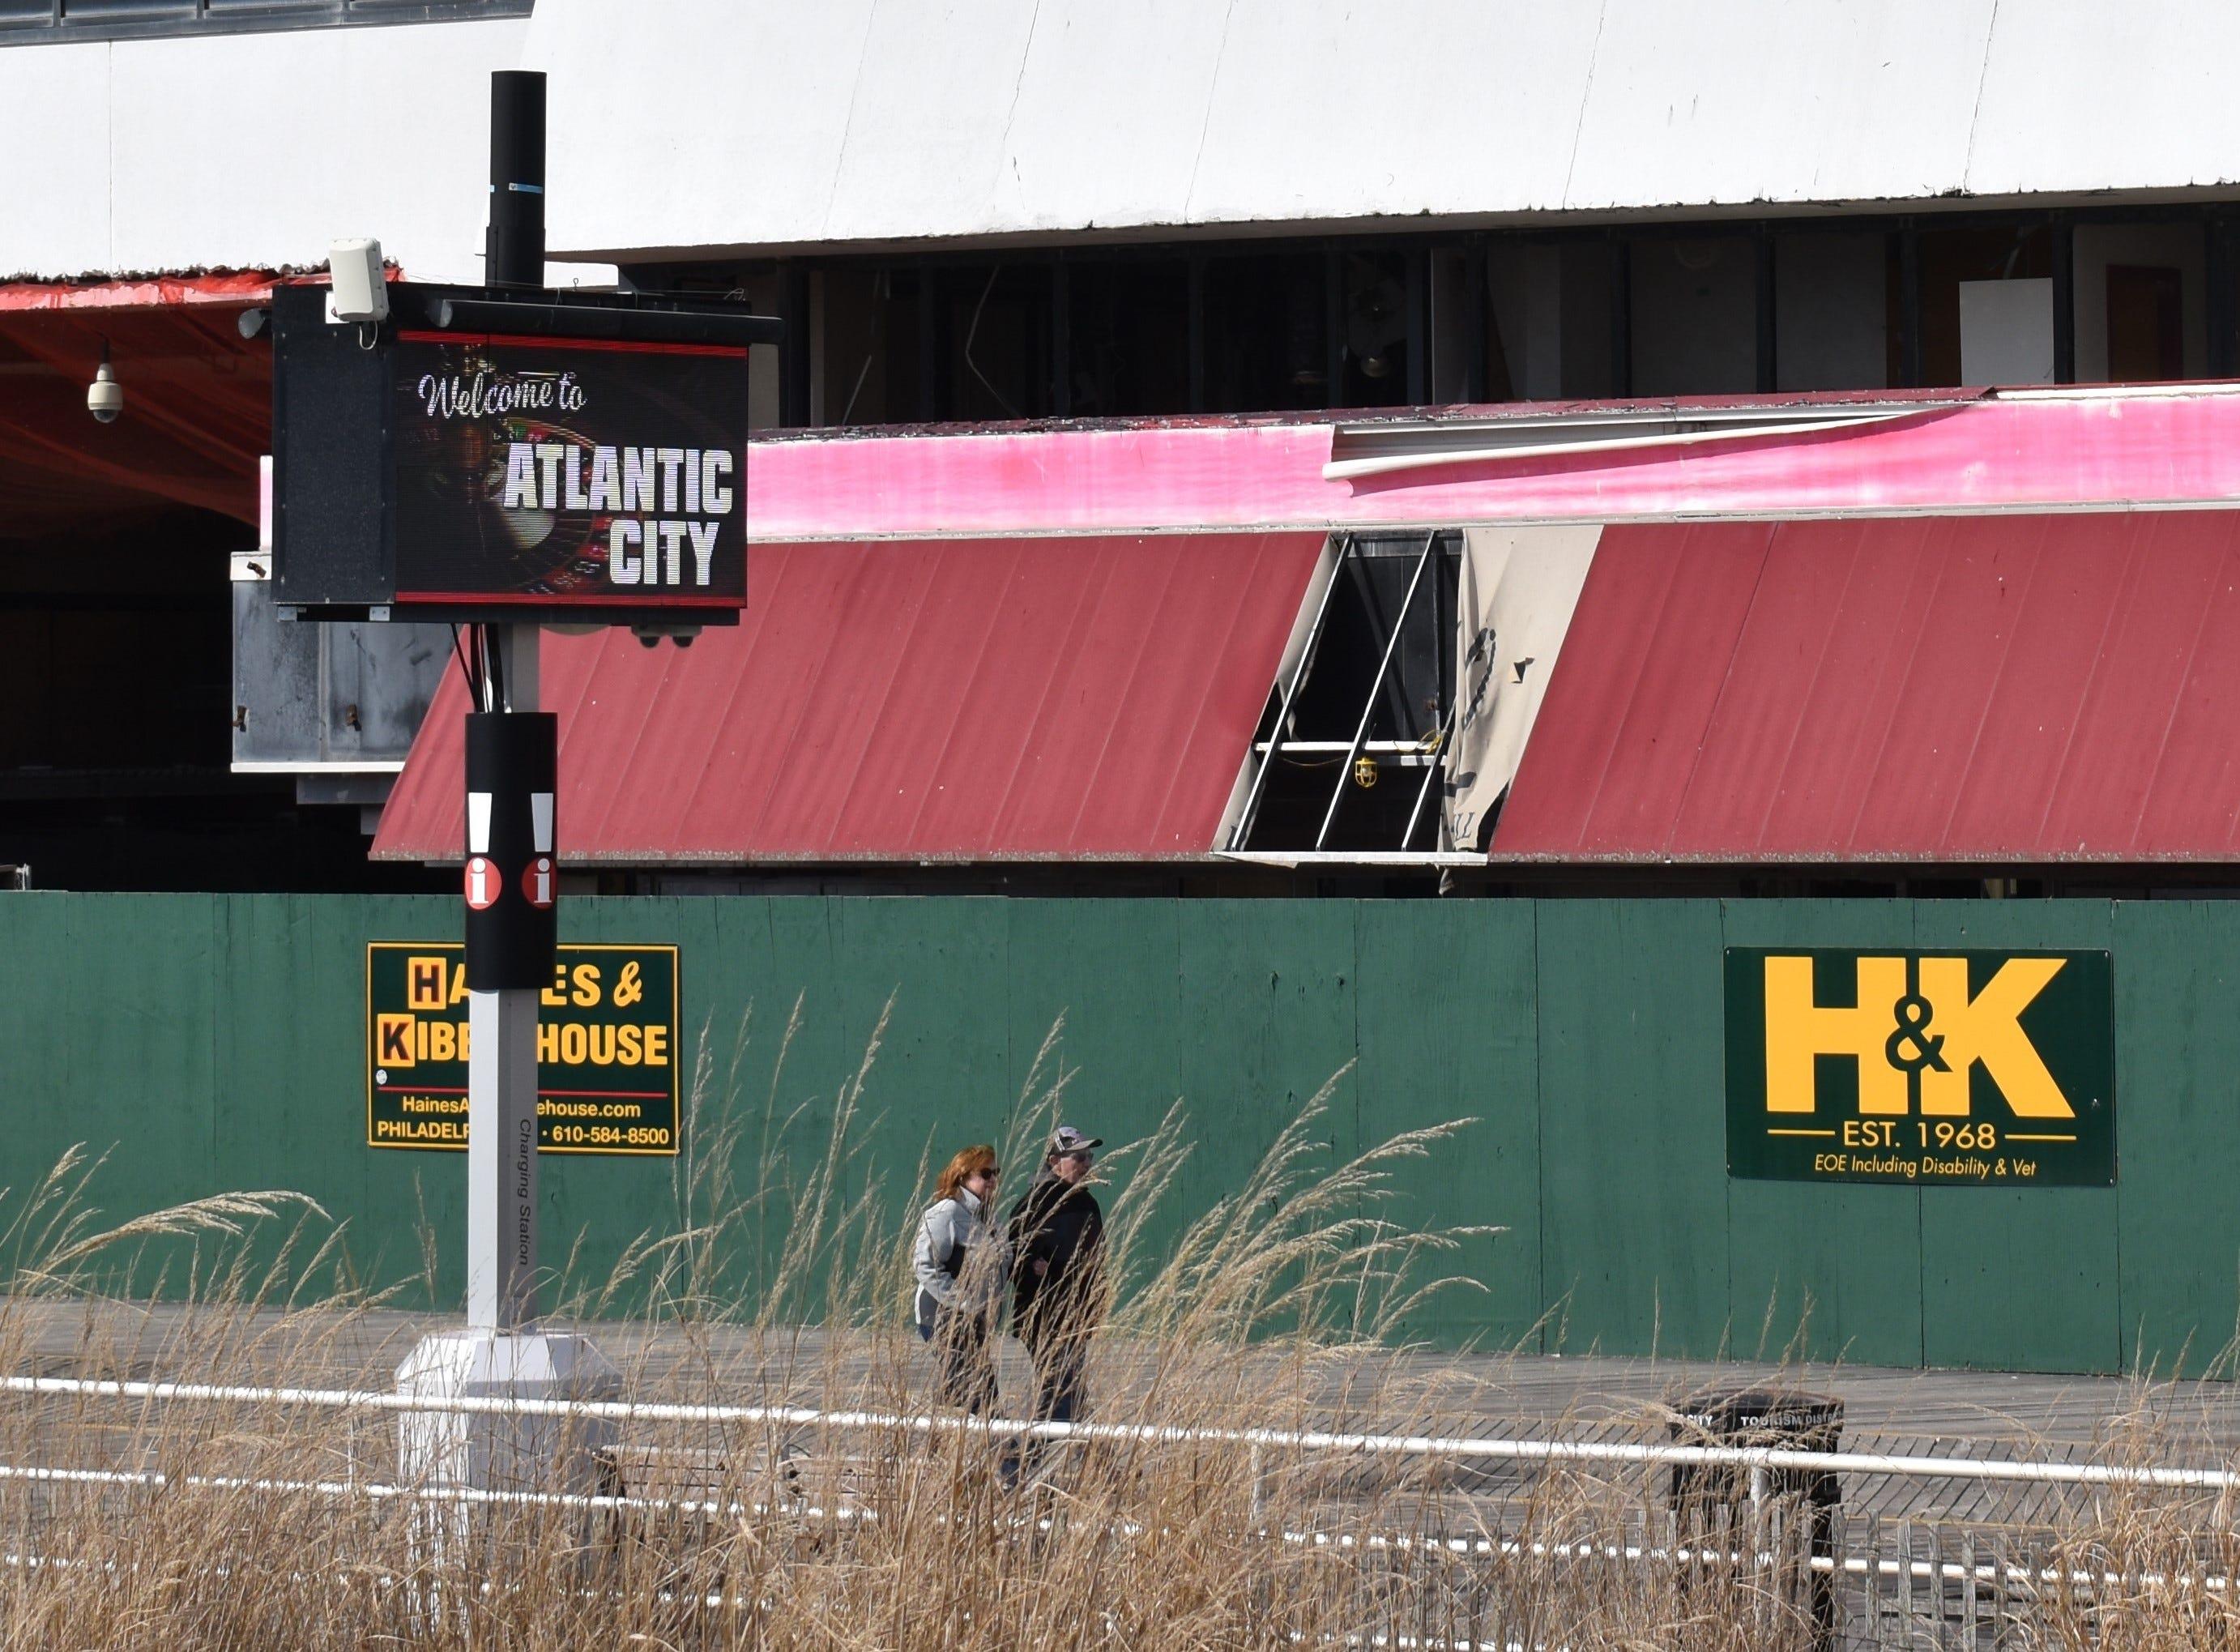 The dilapidated Trump Plaza awaits demolition in Atlantic City.